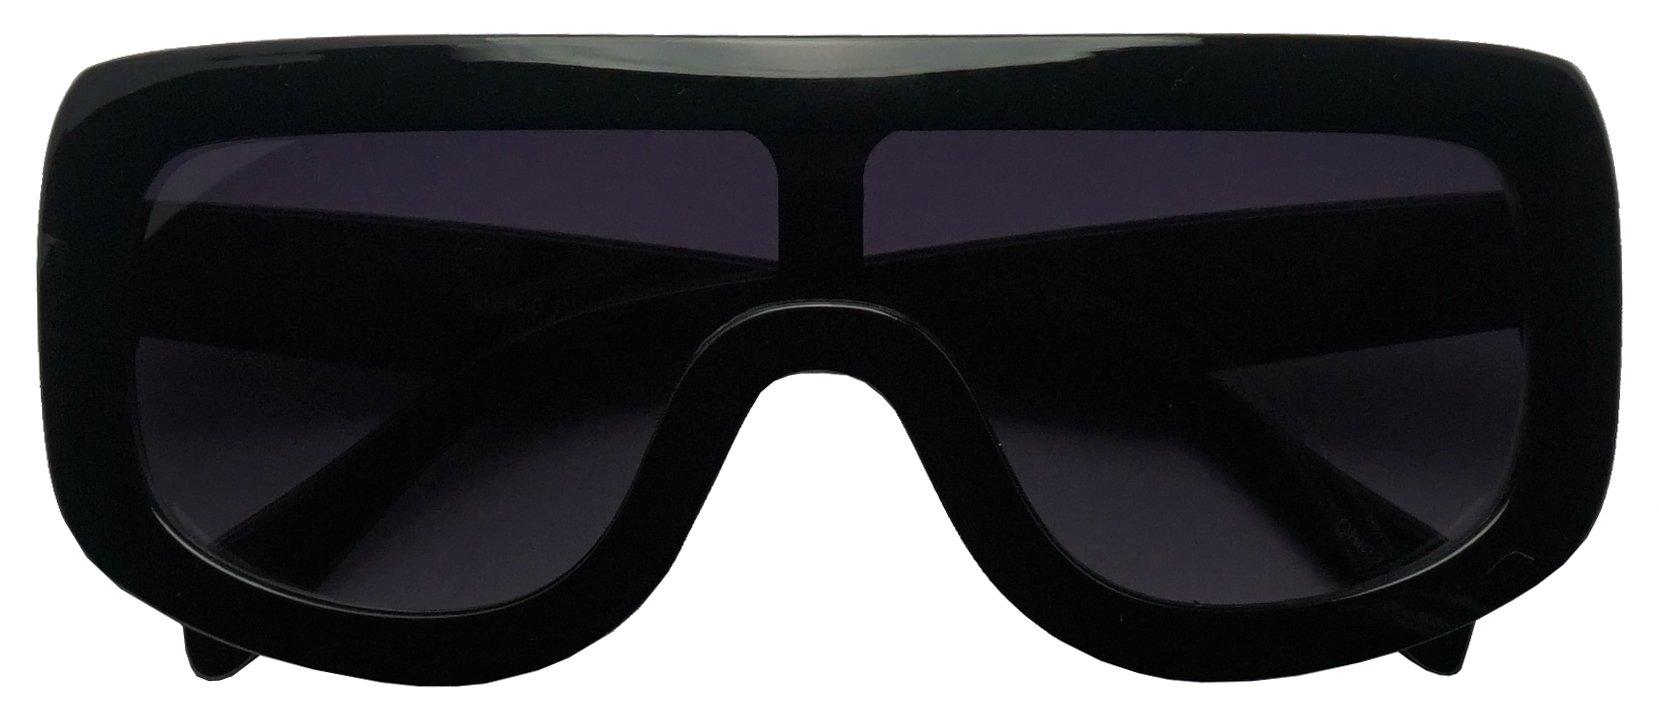 Large Oversized Full Shield Squared Bold Flat Top Sunglasses Retro goggle Shades (Black, 75)